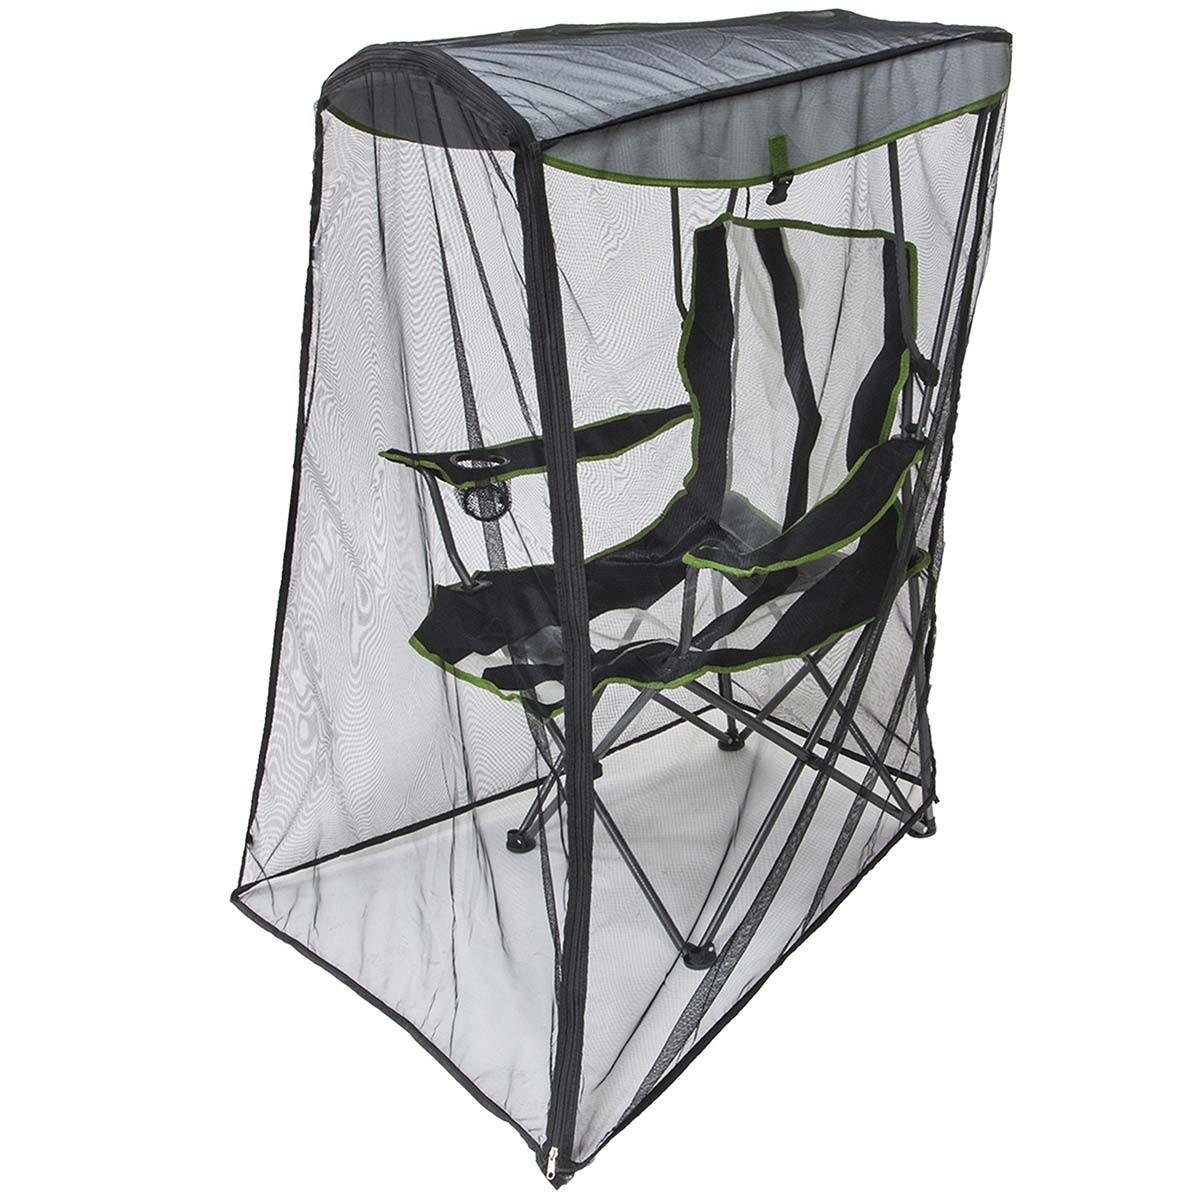 folding canopy chair high boy beach chairs kelsyus w bug guard insect screen